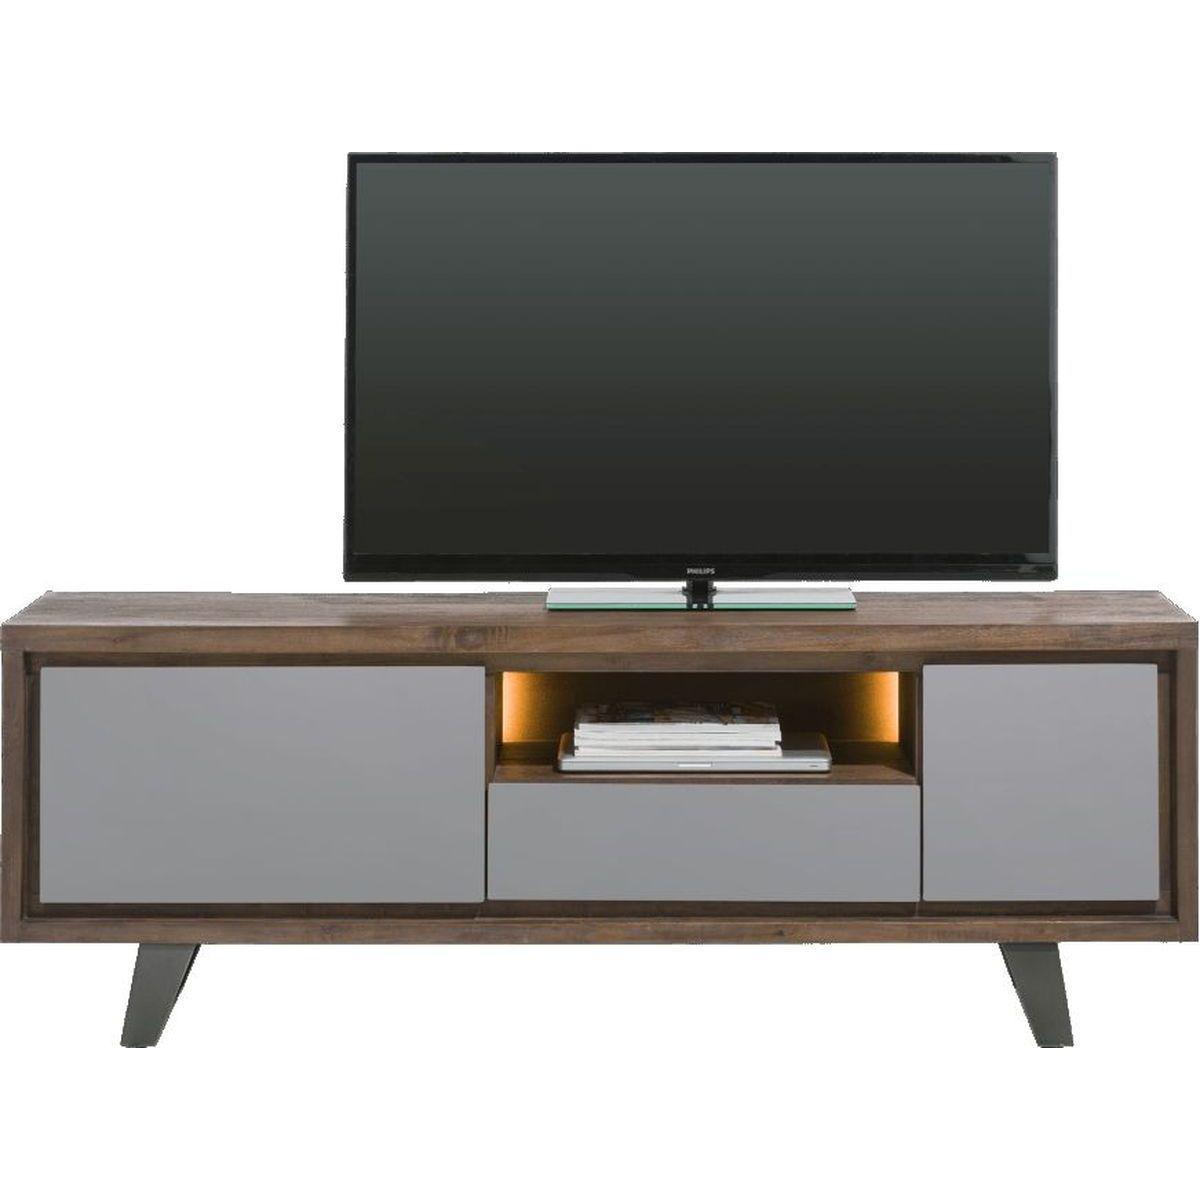 Meuble TV BOX Henders & Hazel 170cm Tramwood Walnut gris